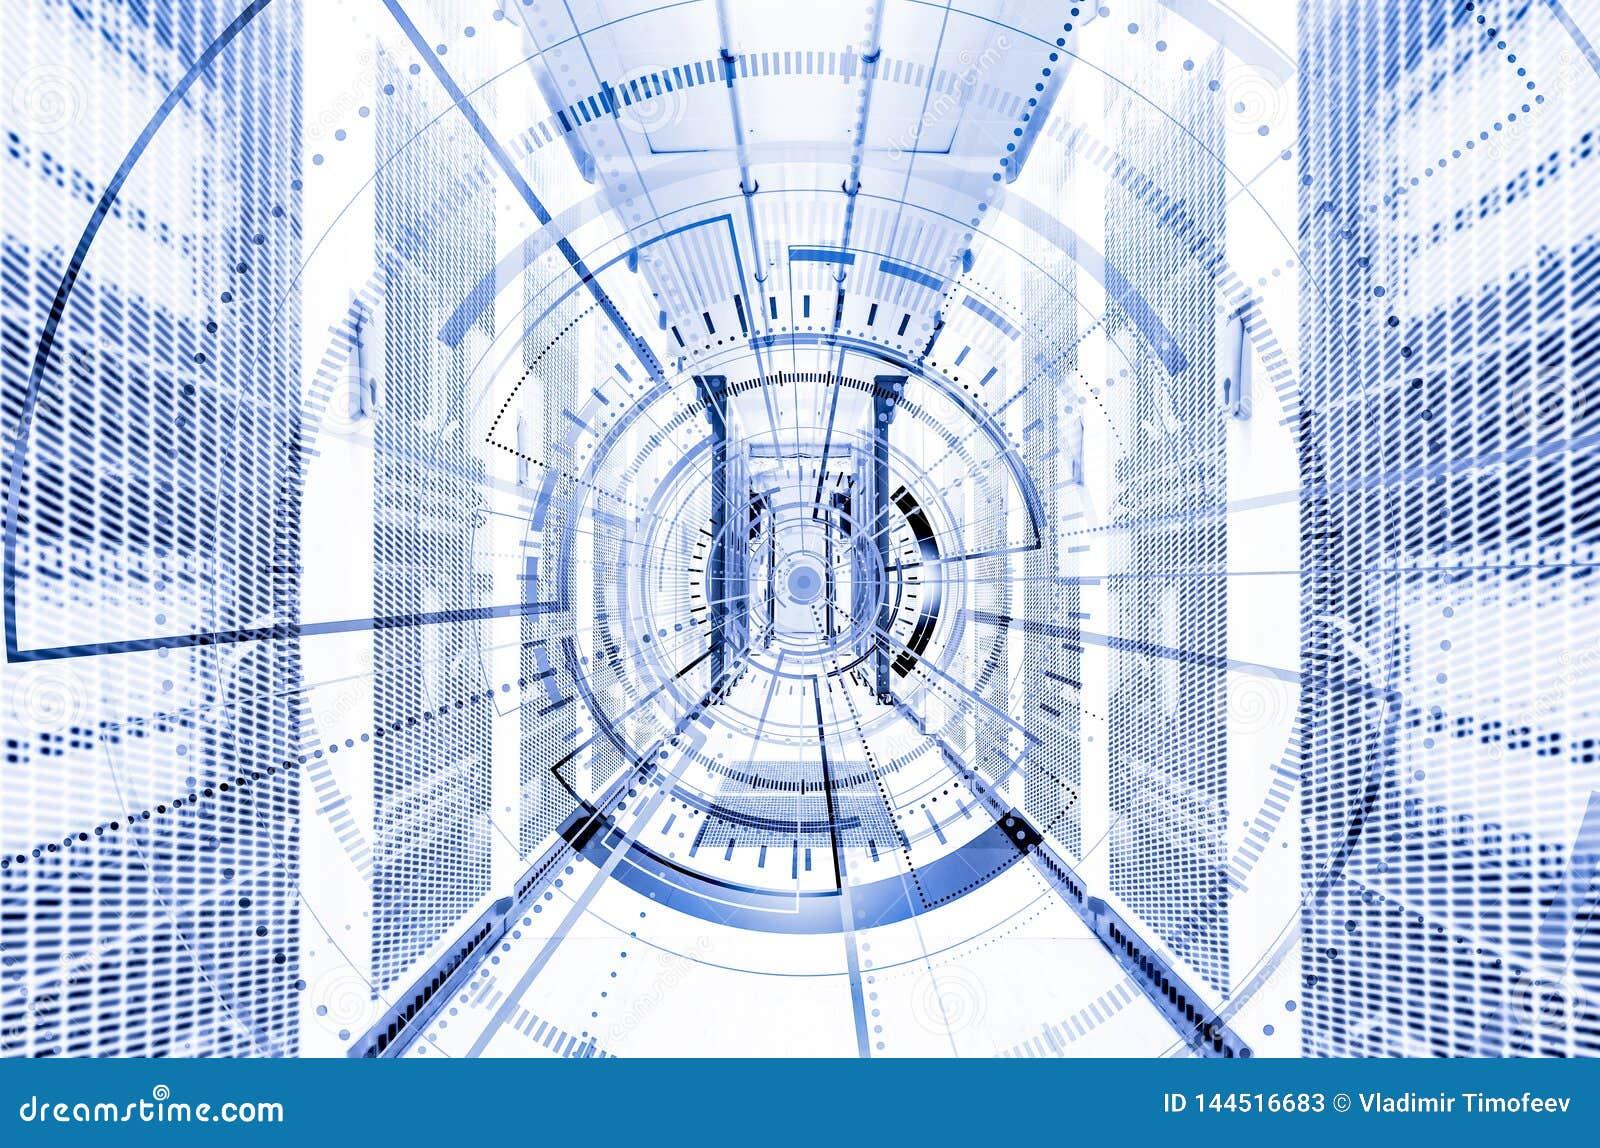 Elemento digital do círculo tecnologico abstrato do fundo Papel de parede interativo do Cyberspace futurista do hardware Projeto